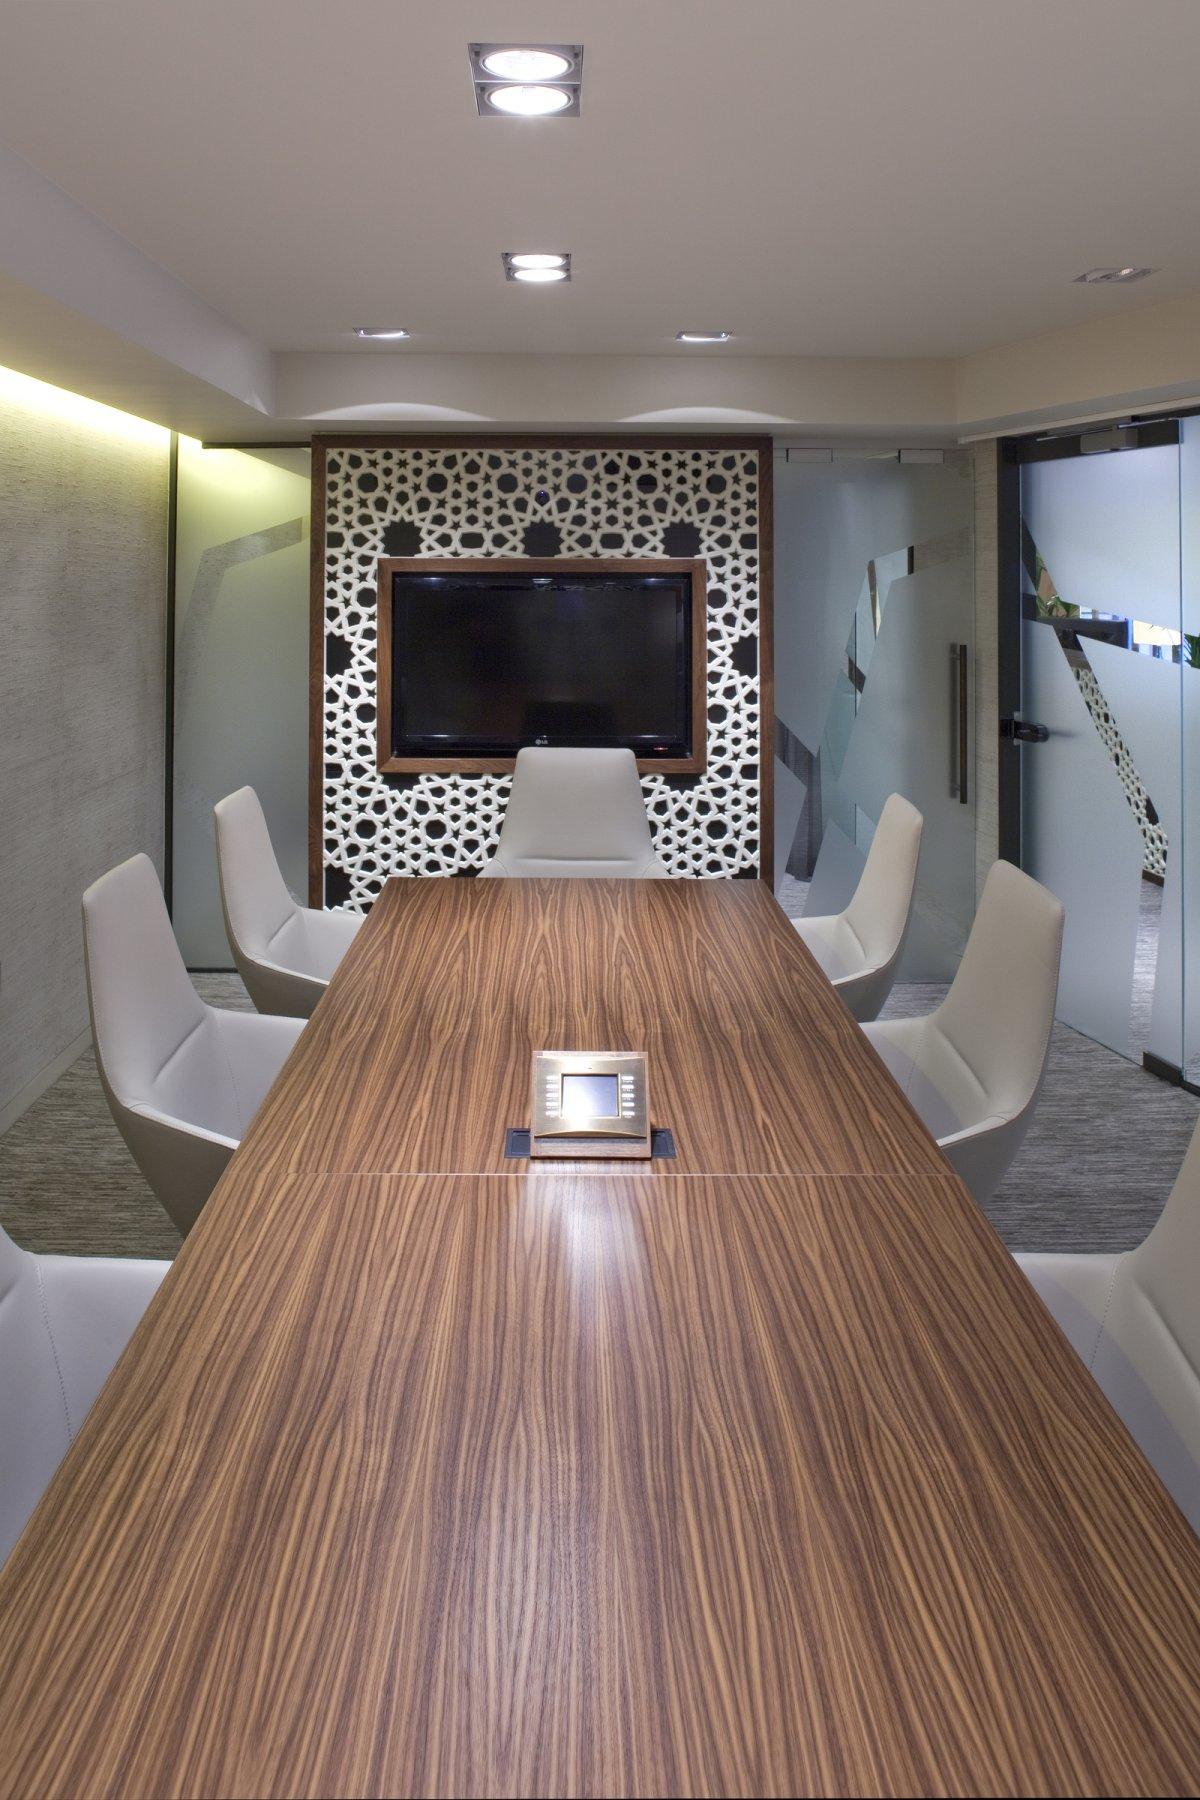 Design Room Layout Online: Rizon Jet Lounge By SHH